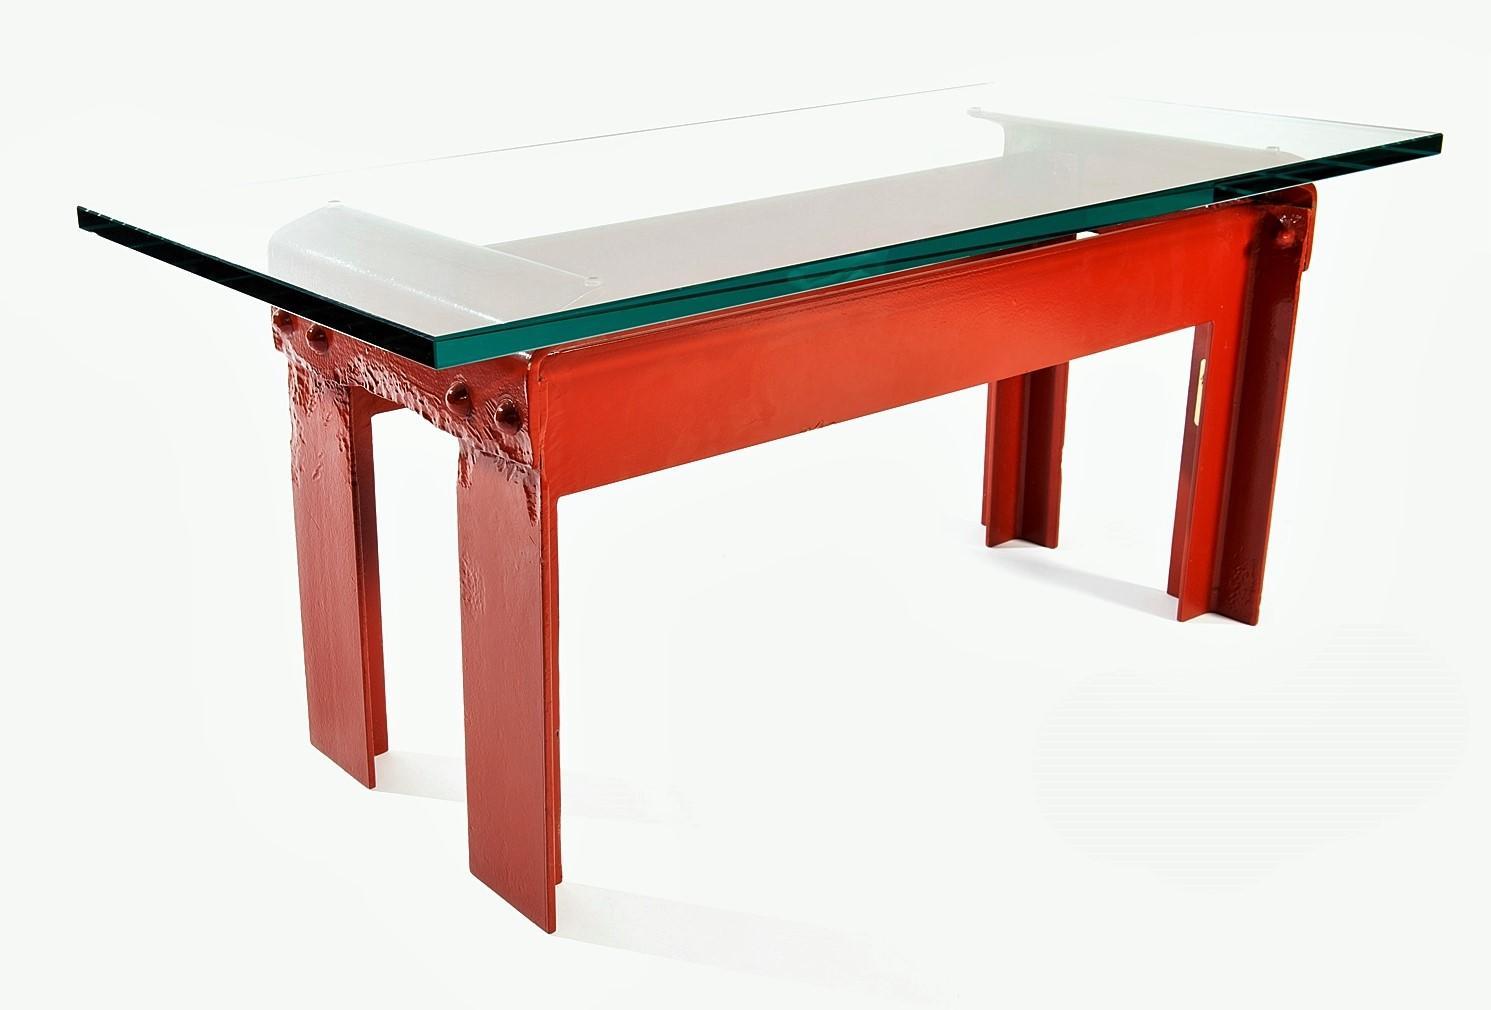 Golden Gate Bridge Steel - Coffee Table